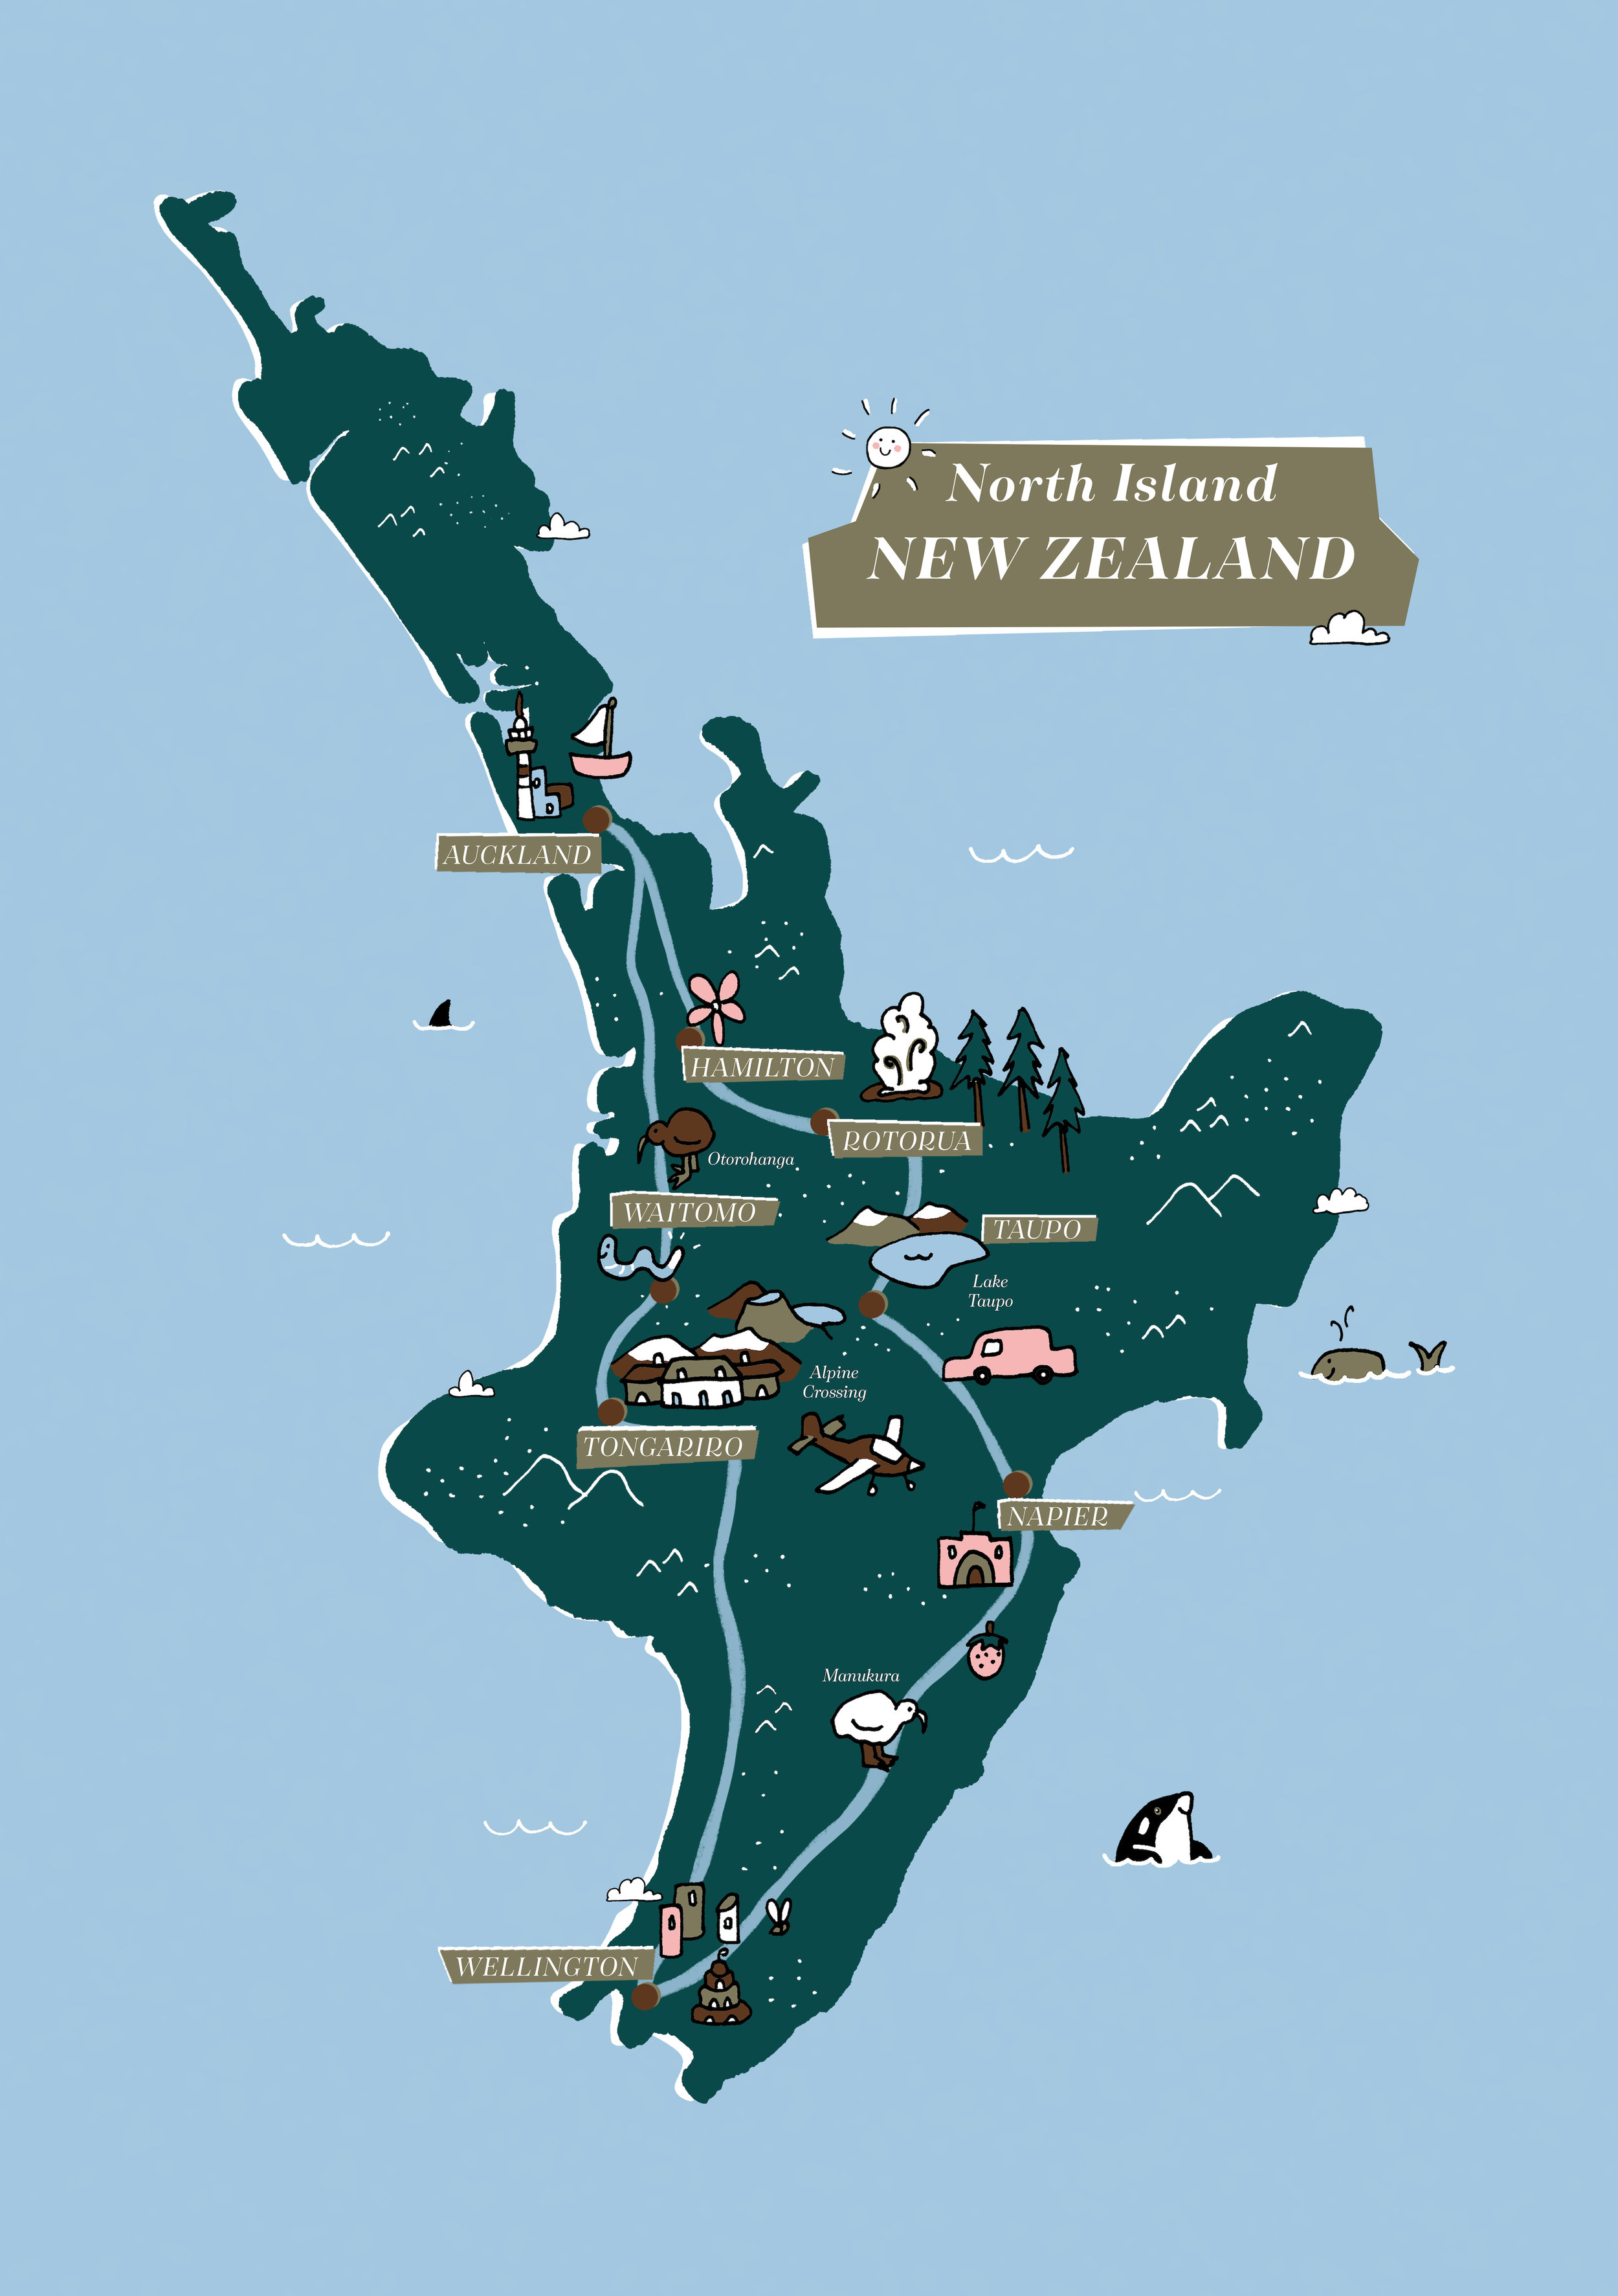 North Island New Zealand, by Megan McKean